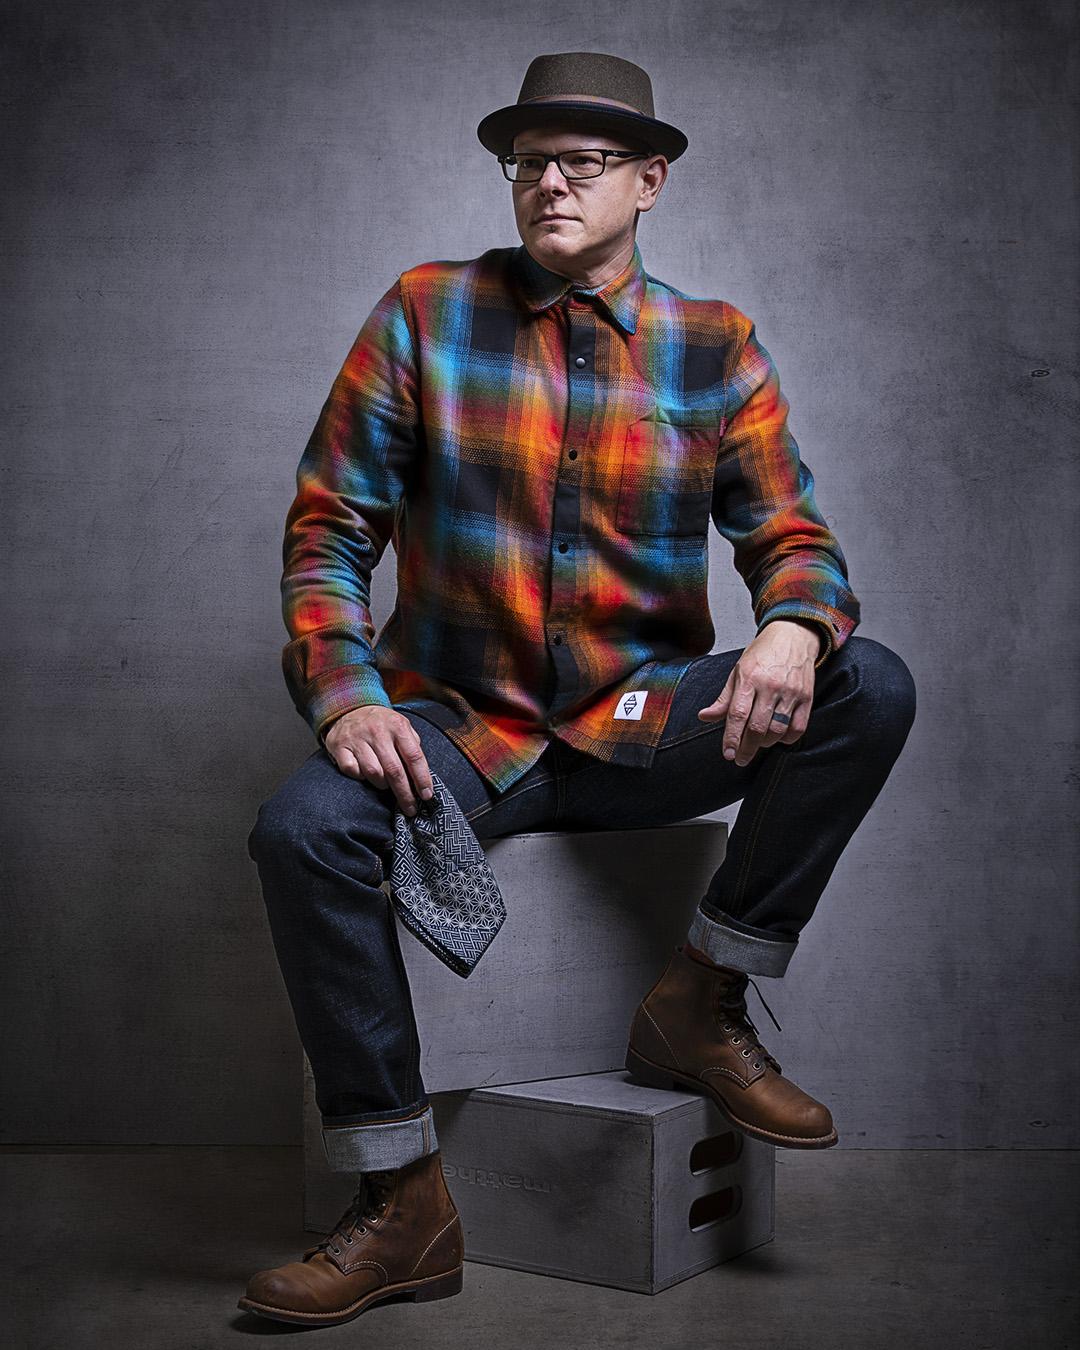 Jarret Beaudis founer and  lead designer